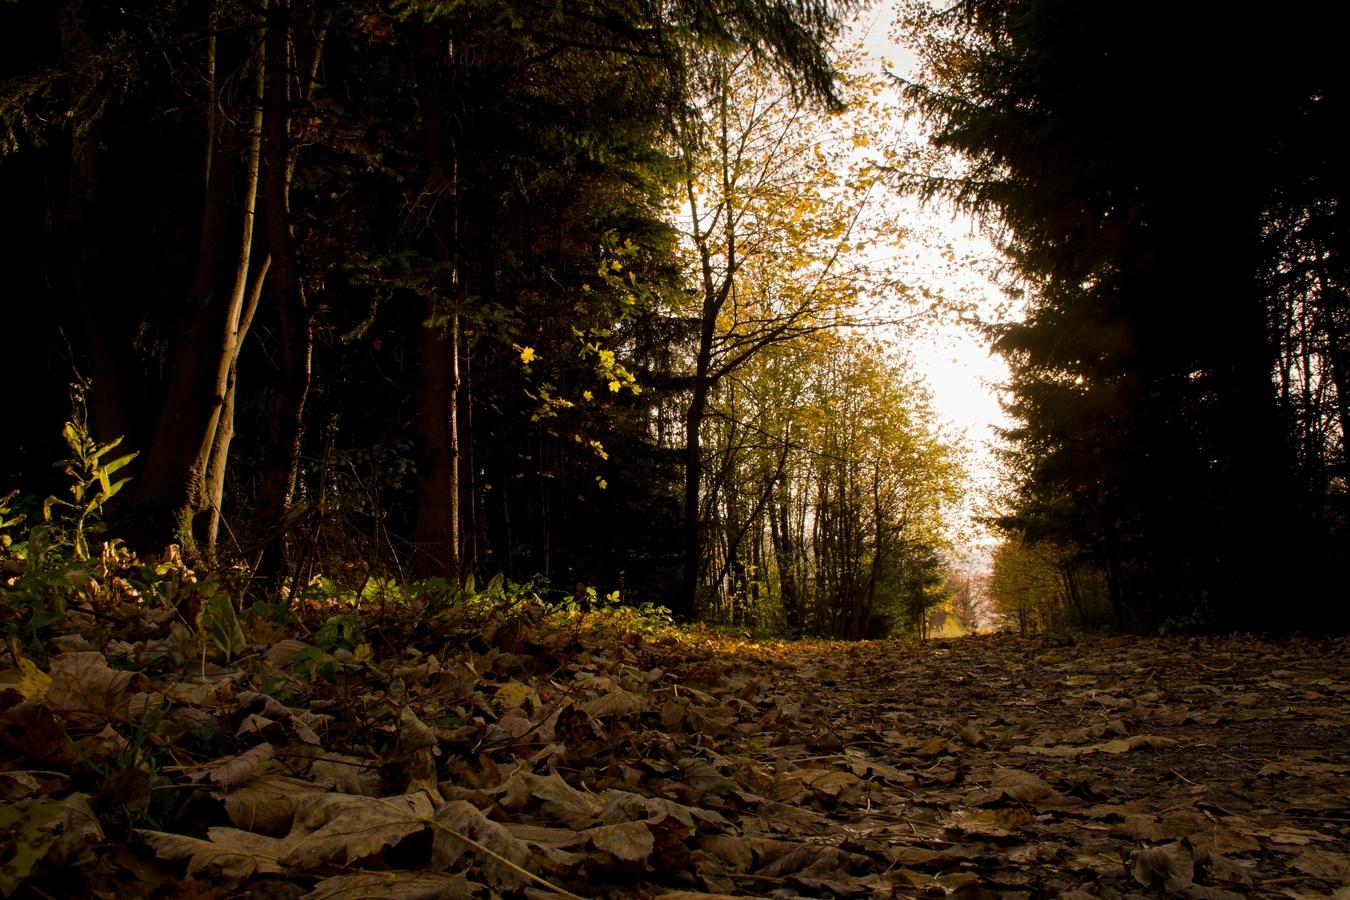 Pešinka v lese